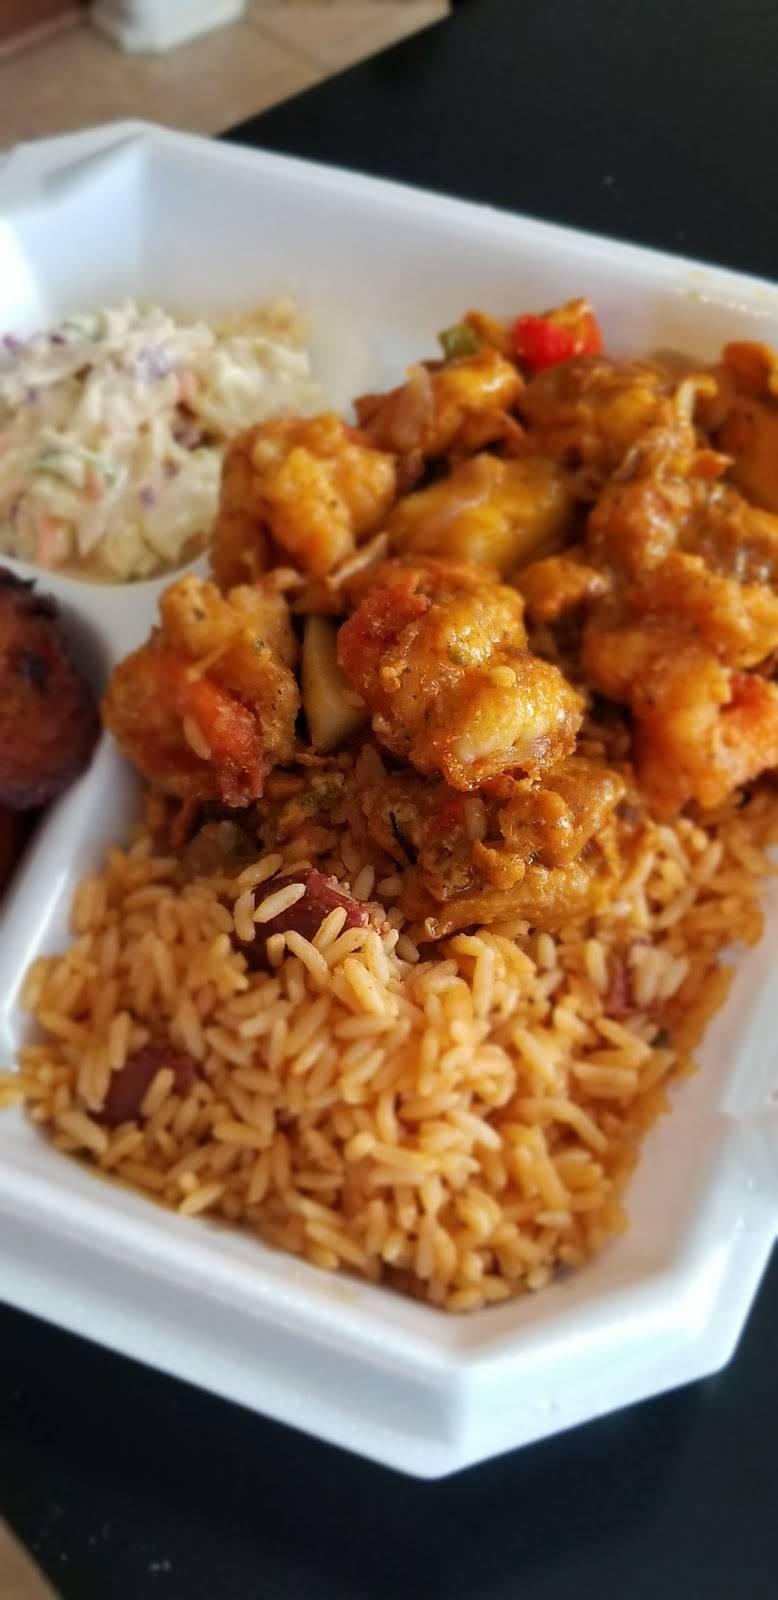 Noors Caribbean Kitchen   restaurant   26023 Laurel Pass, San Antonio, TX 78260, USA   8627550601 OR +1 862-755-0601